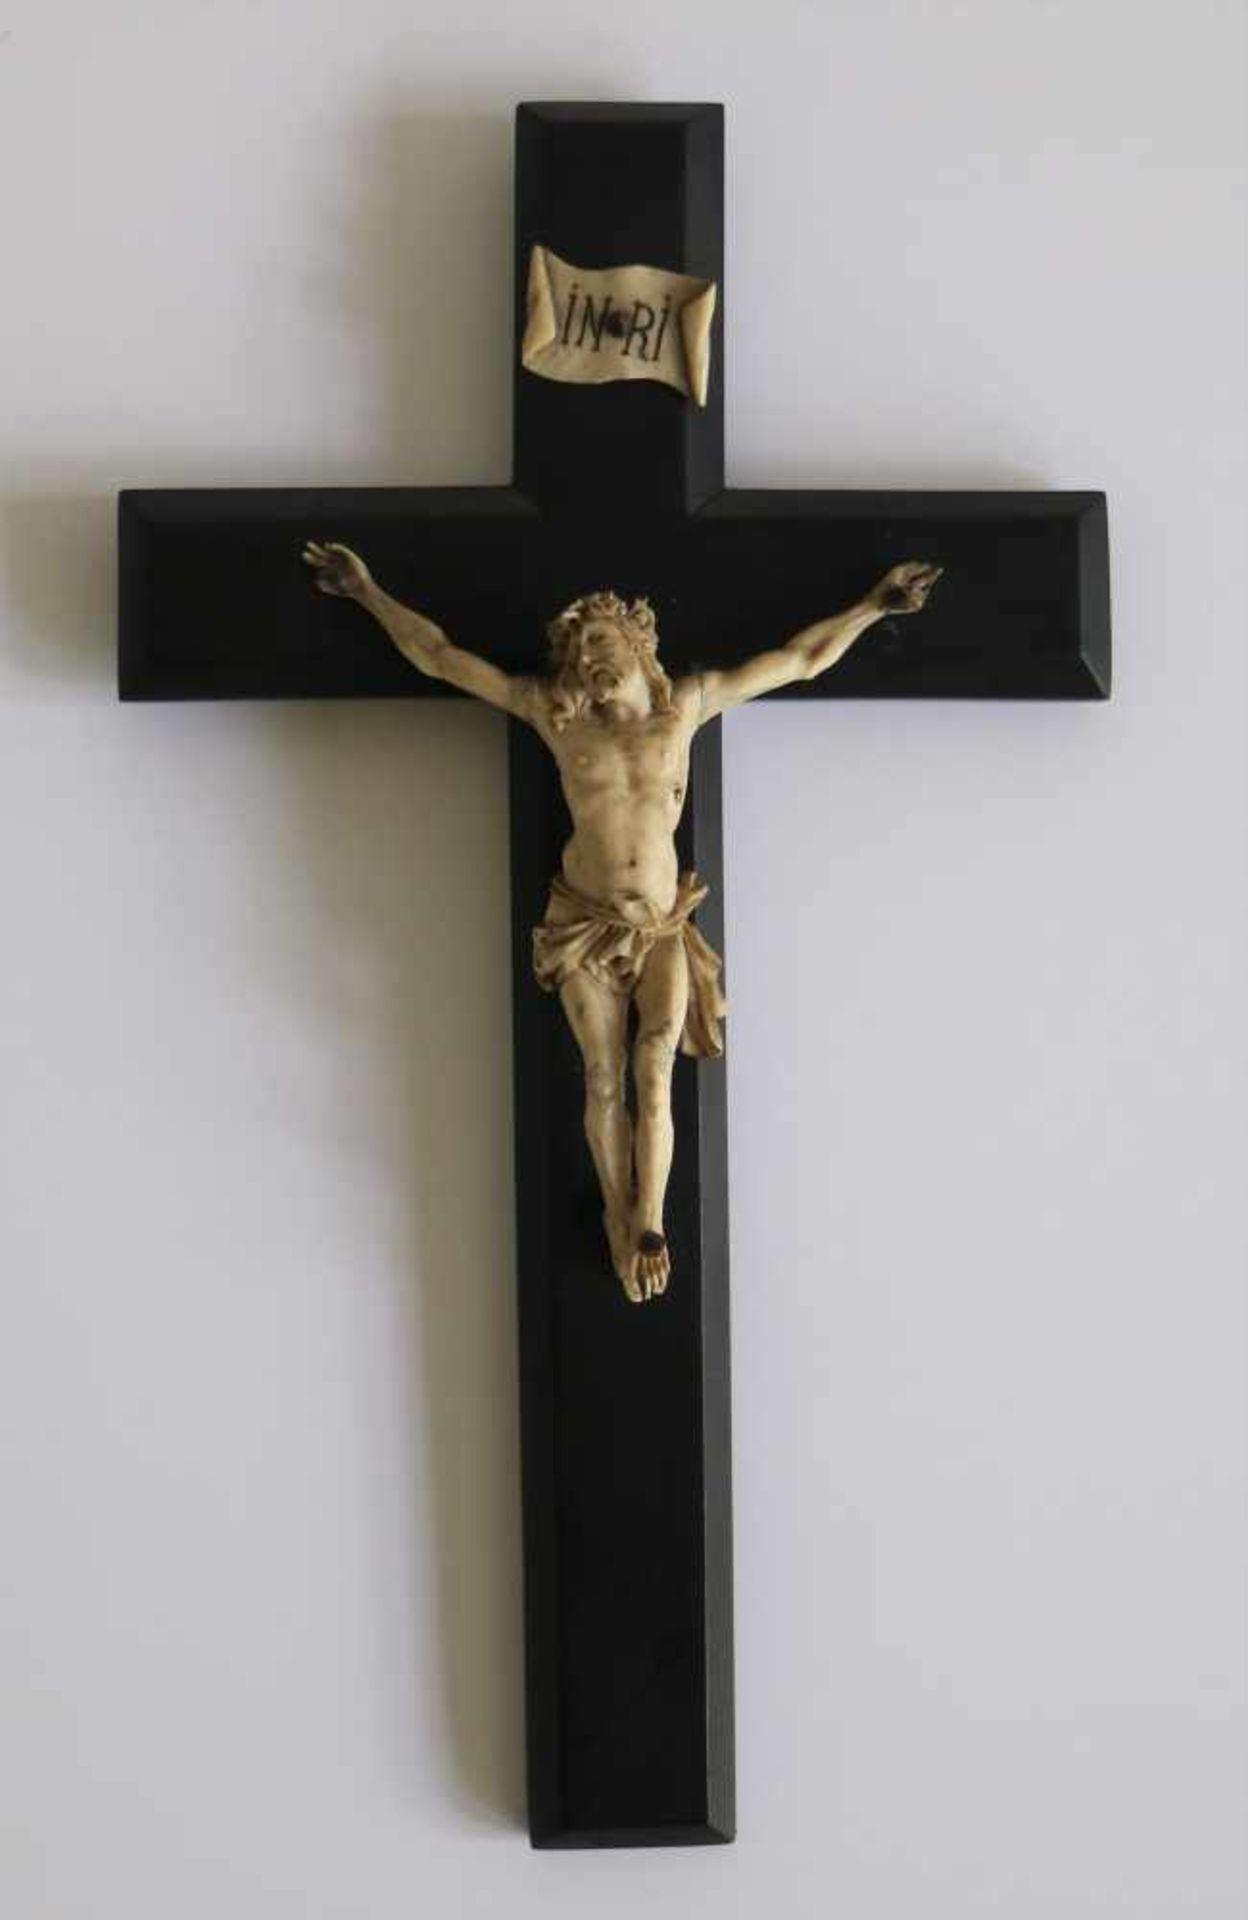 Corpus Christi ivory verso plaque R. Middegaels Bruxelles H 25 B 14 cm (H corpus christi 10 cm)